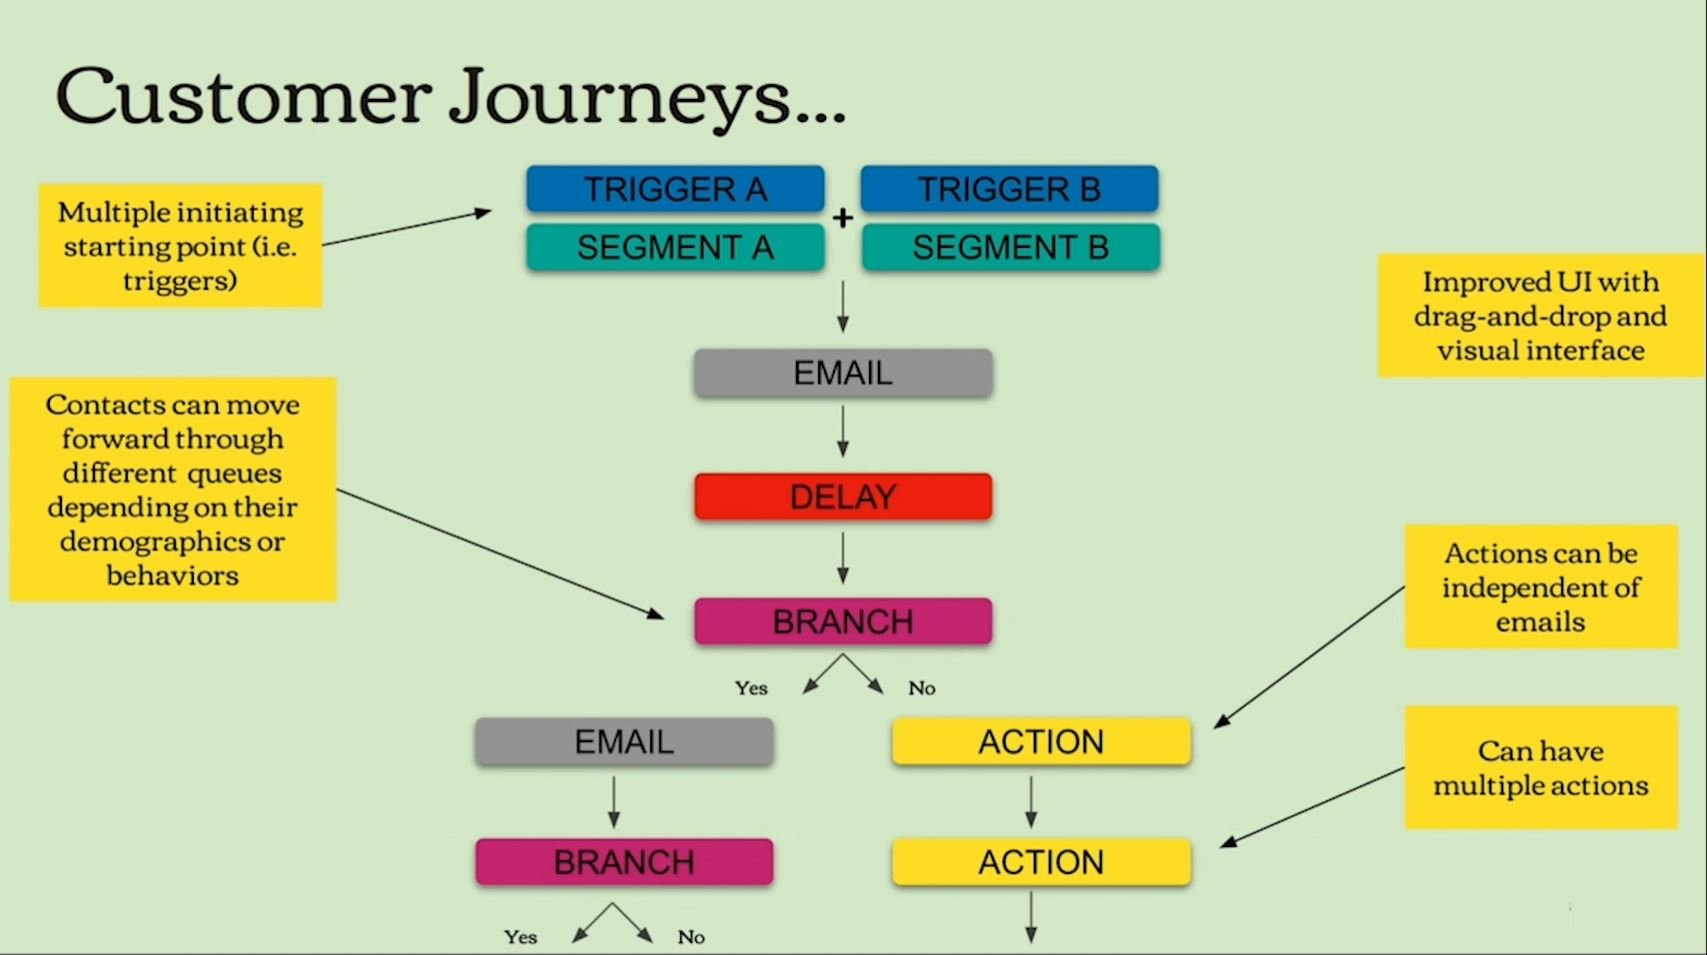 image showing Mailchimp Customer Journeys